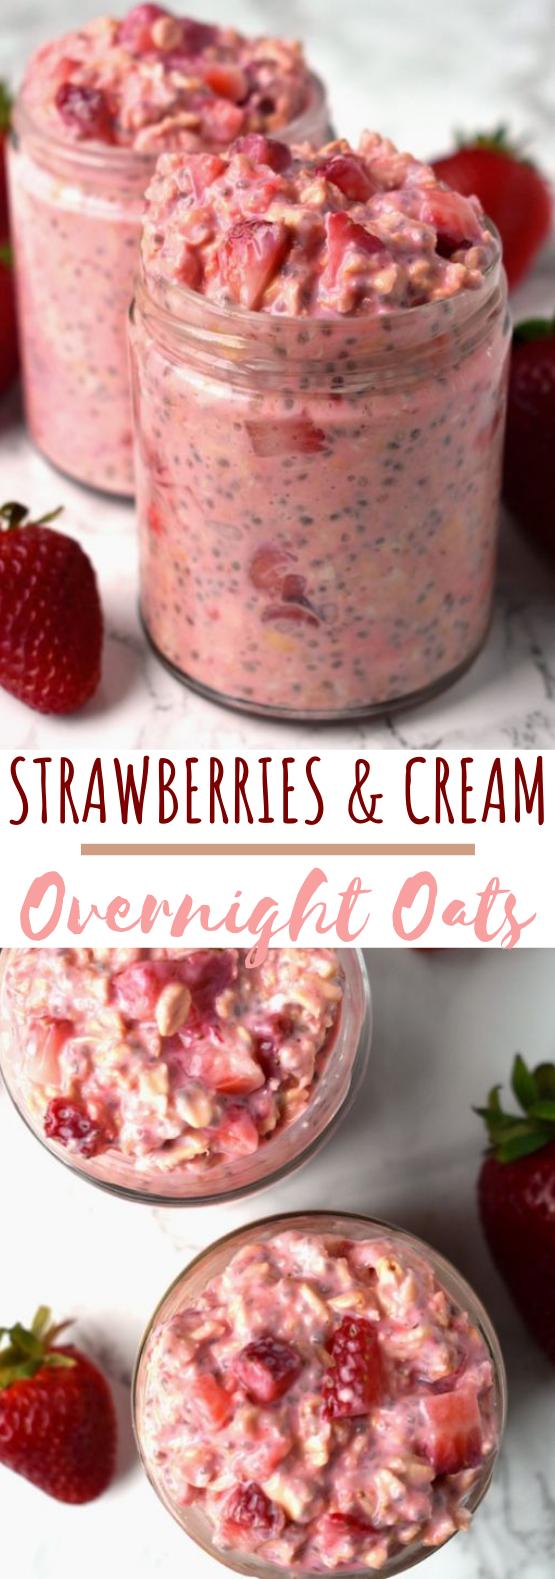 Strawberries and Cream Overnight Oats #healthy #breakfast #easy #vegetarian #keto